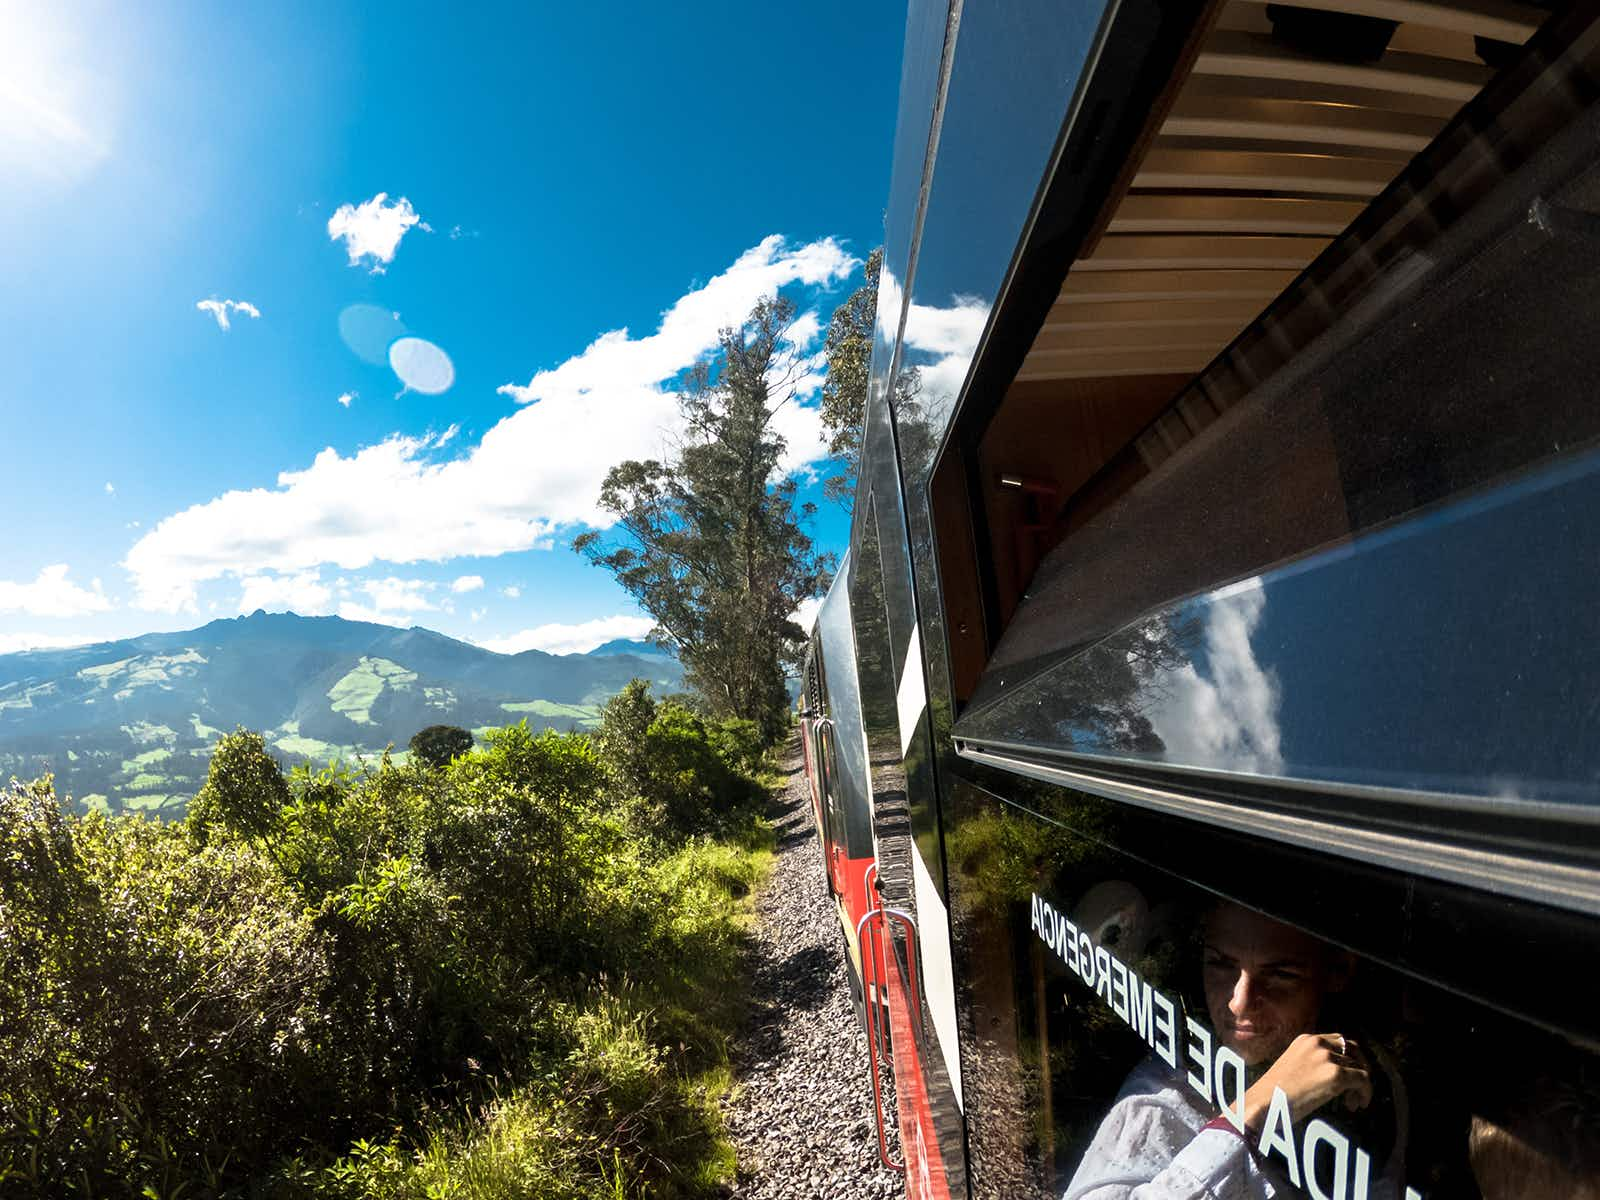 Glide along the tracks winding through the Avenida de los Volcanes with Tren Ecuador © Jonny Bierman / Lonely Planet